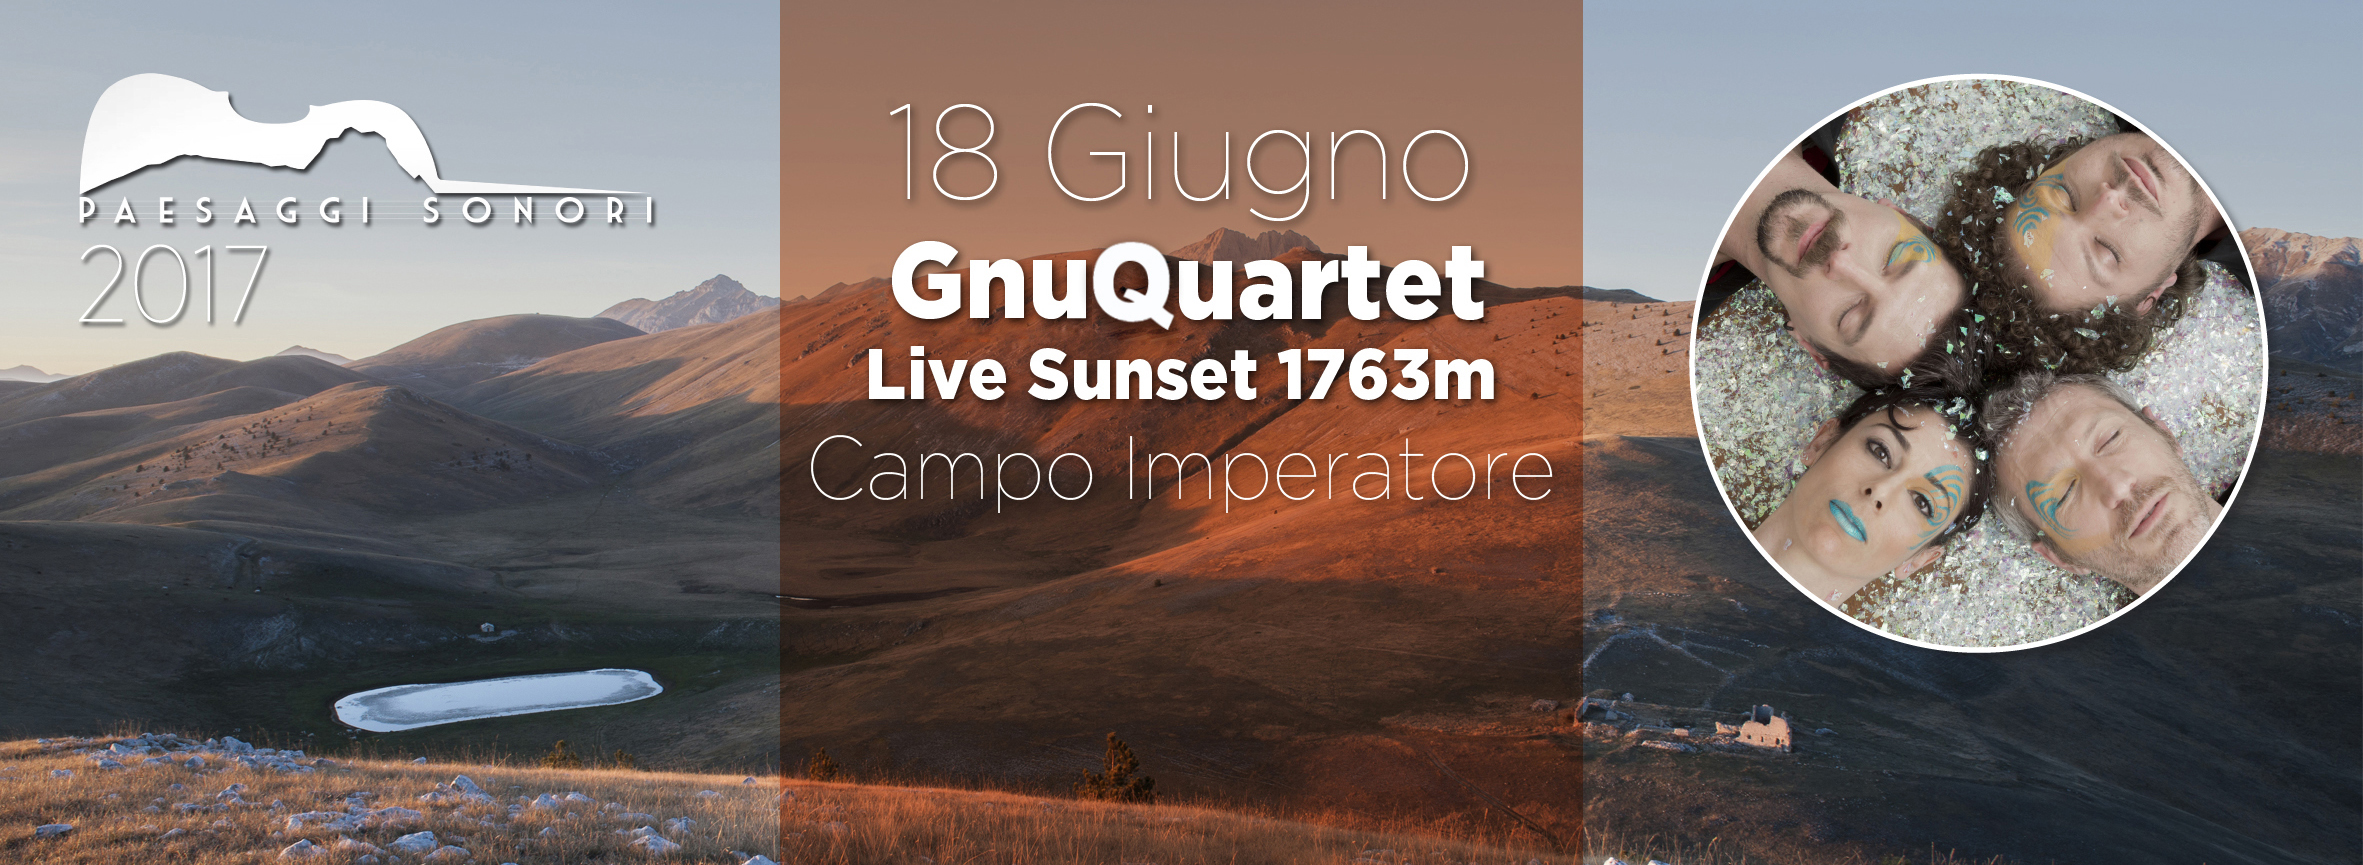 Copertina_GnuQuartet Live Sunset 1763m